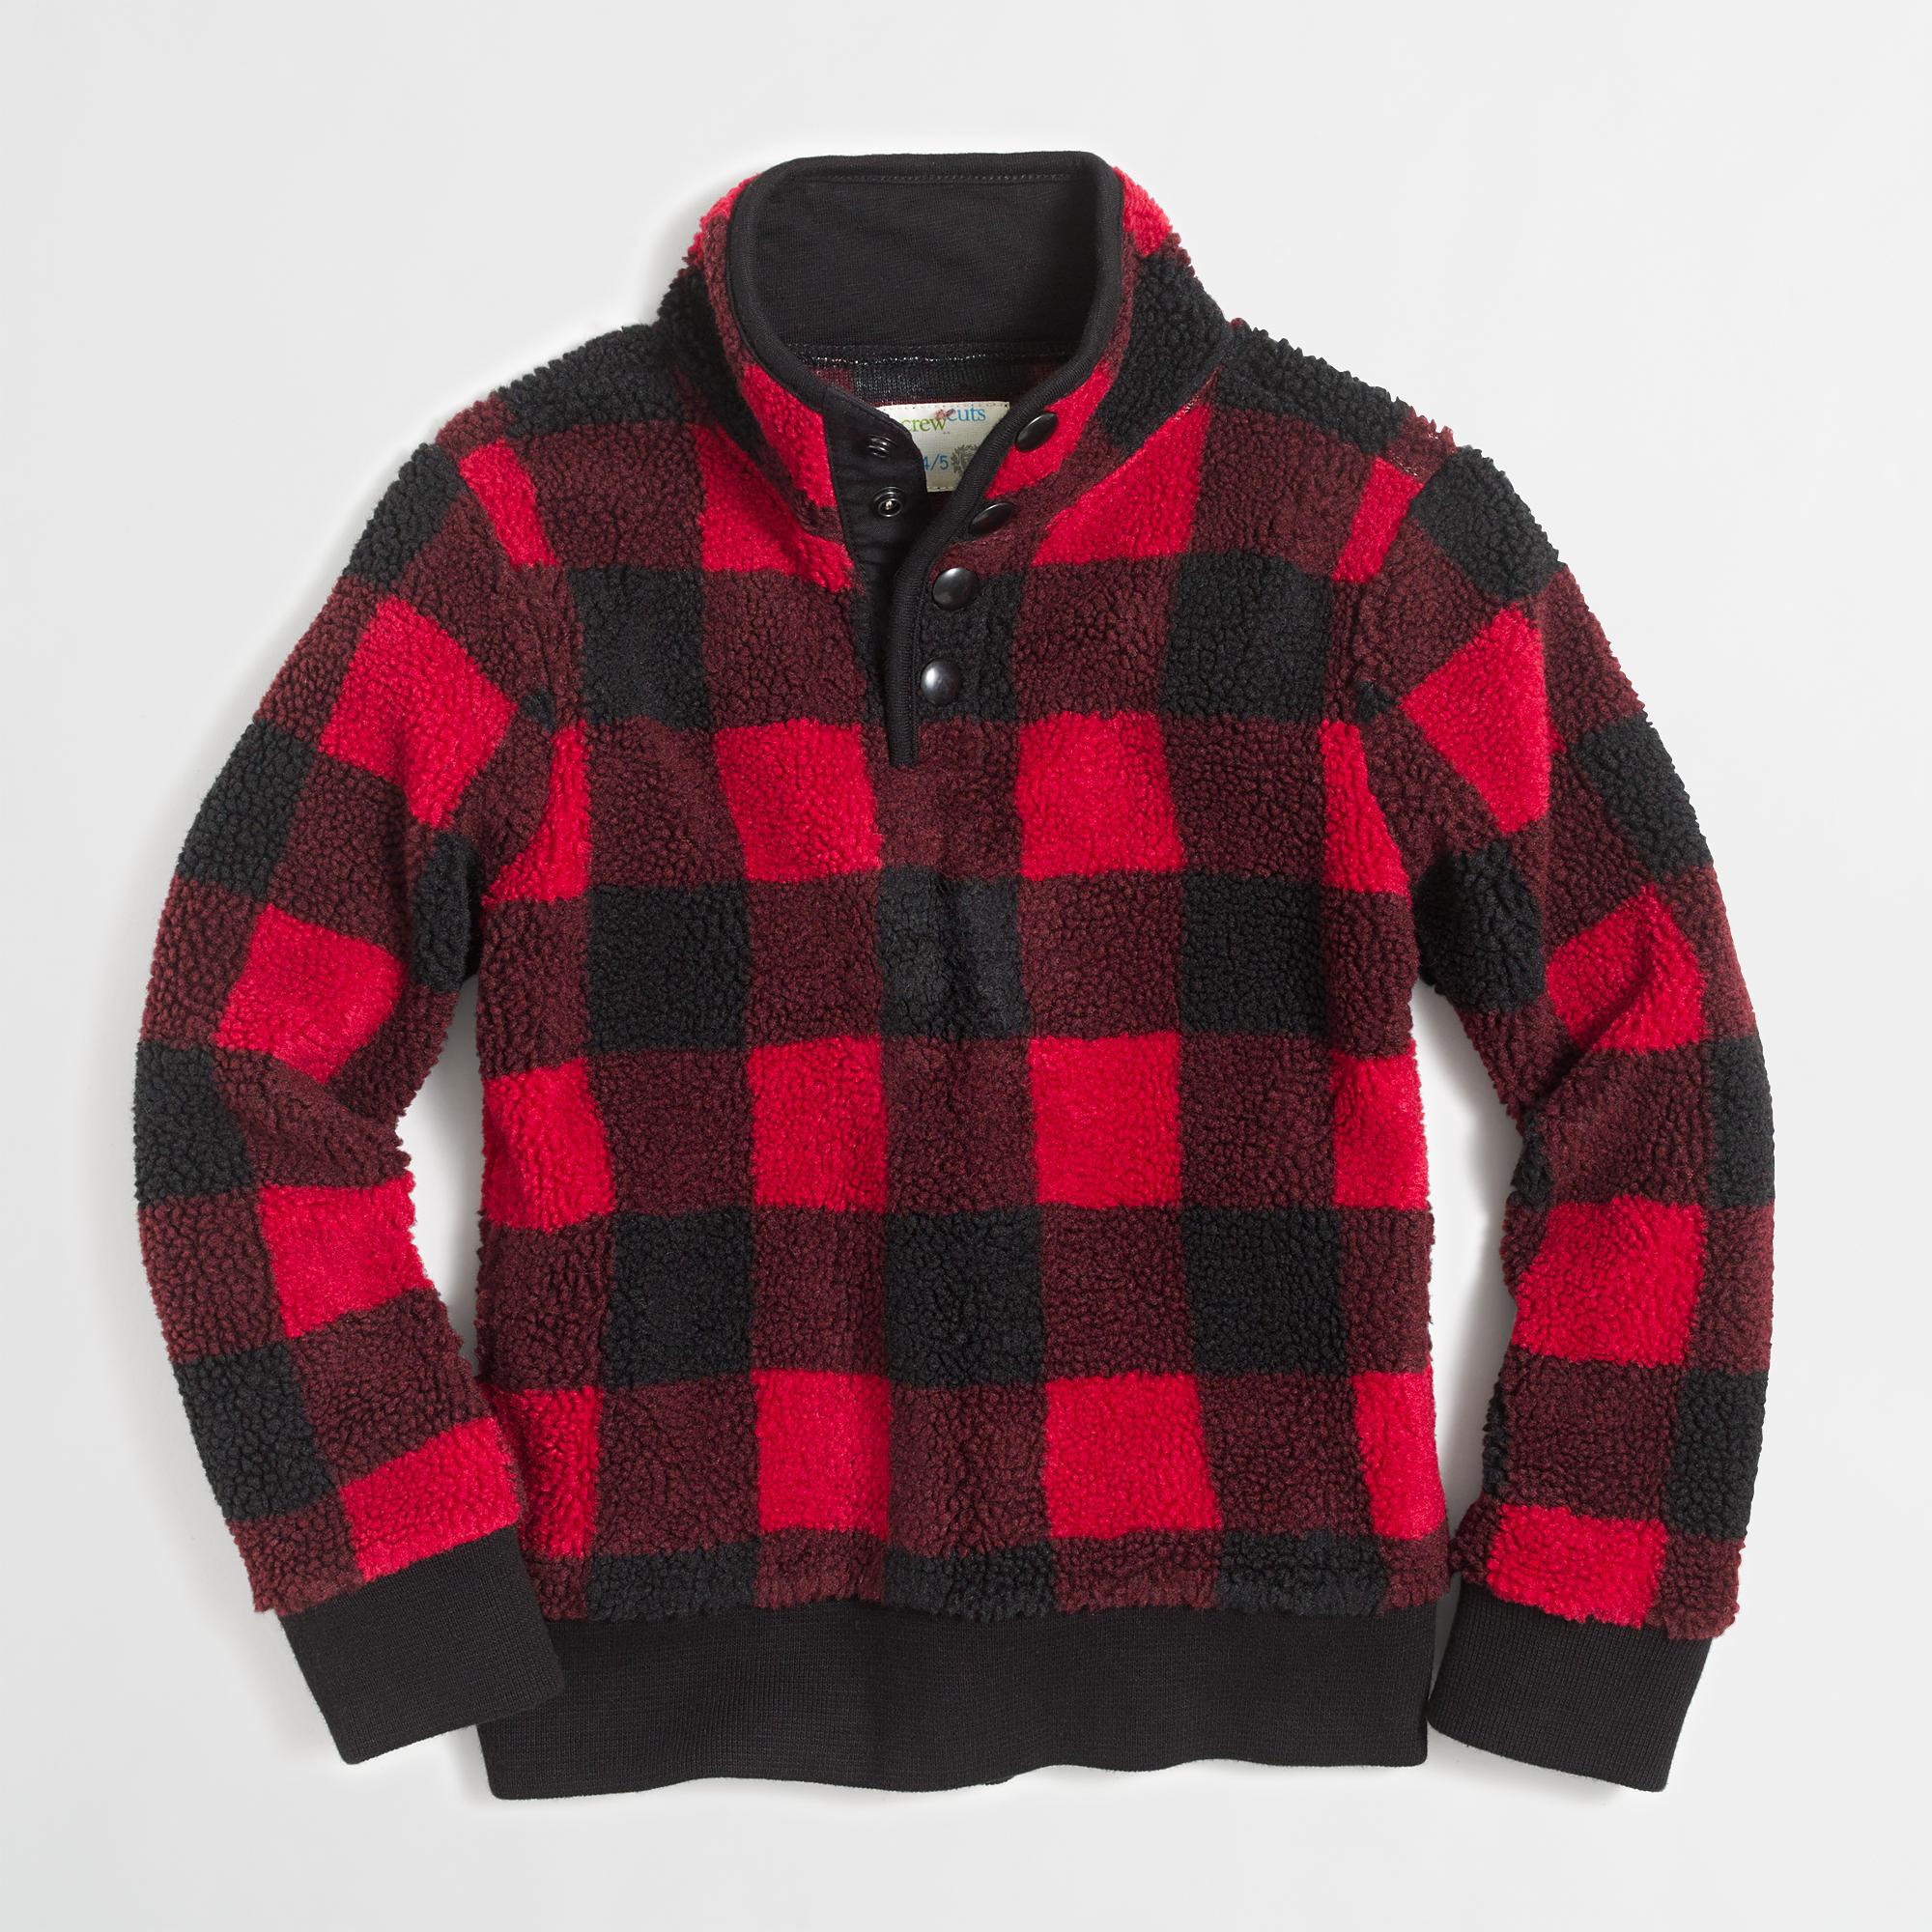 tanger-outlets_jcrew-factory-fleece-pullover